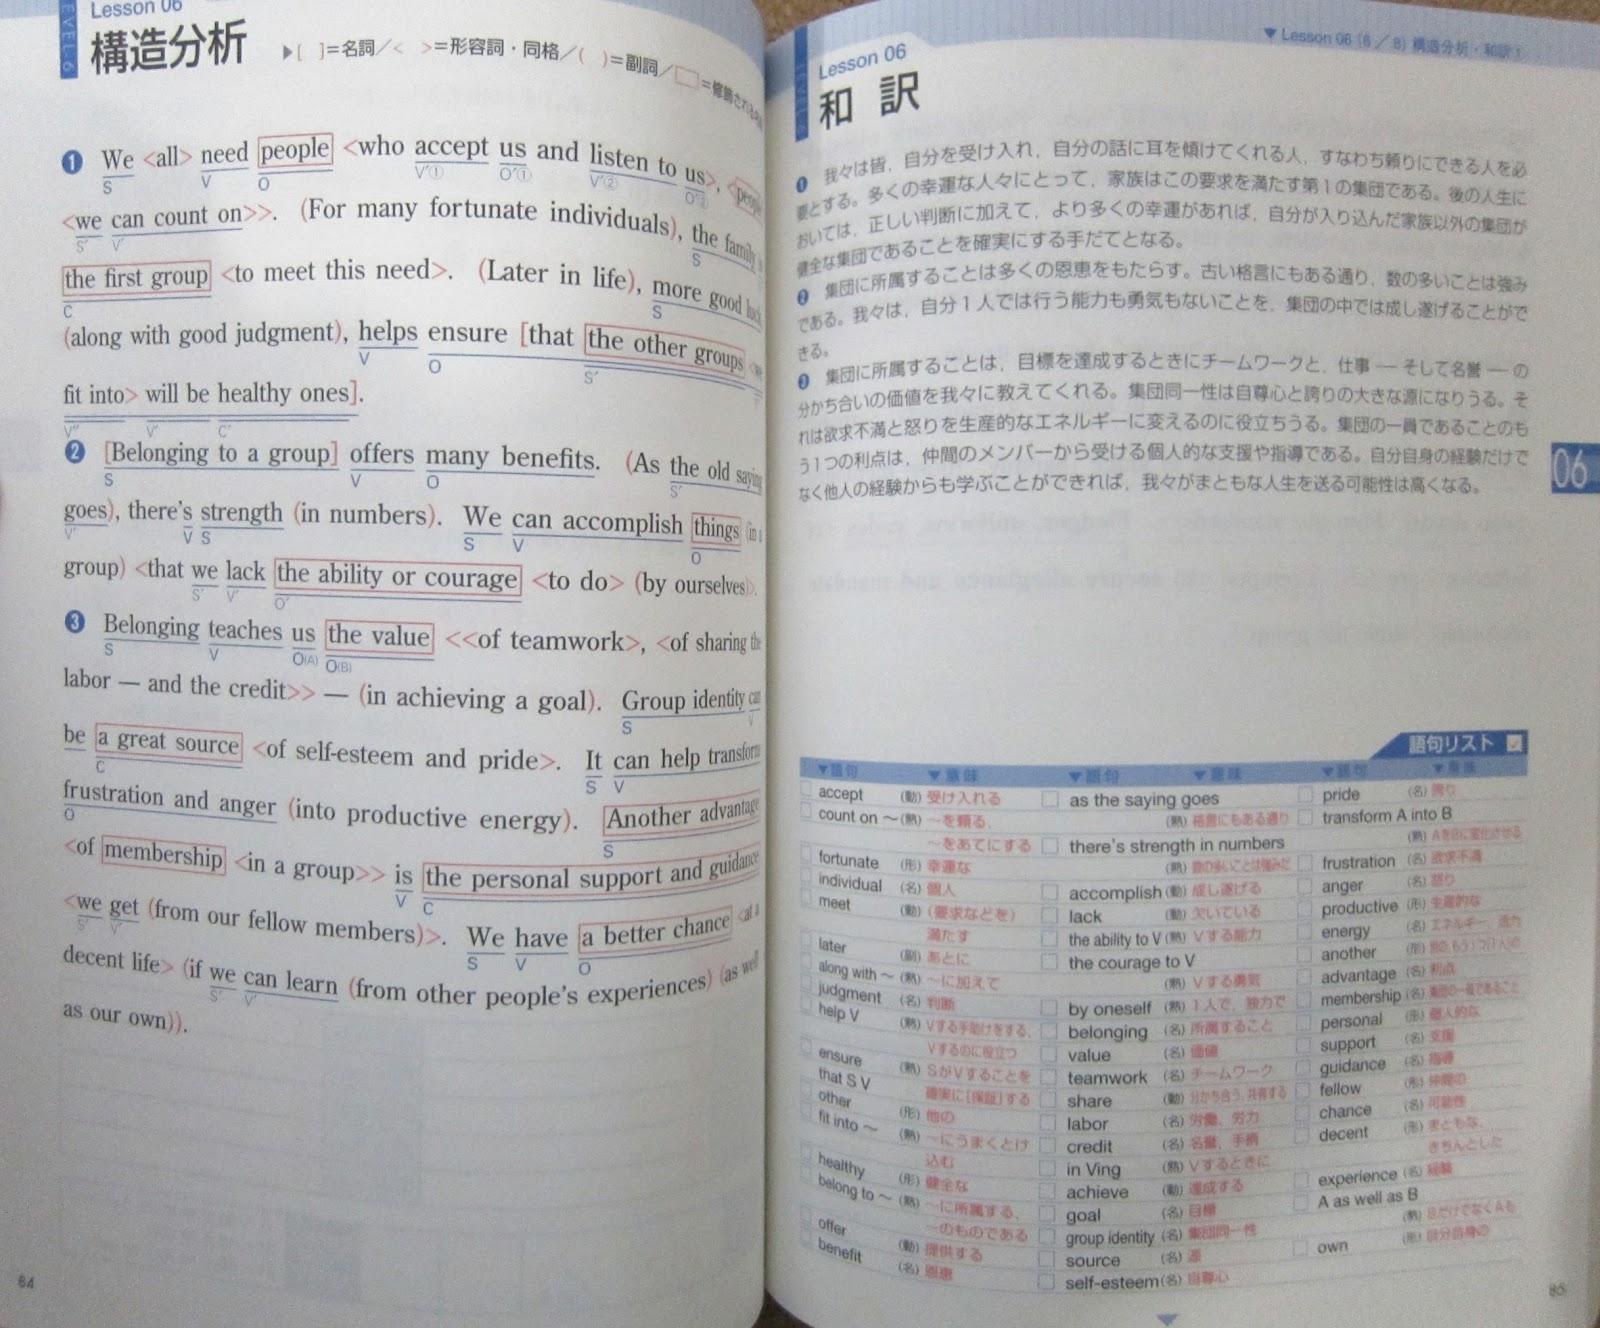 復習ツールも完璧! : 中学 英語 解説 : 中学